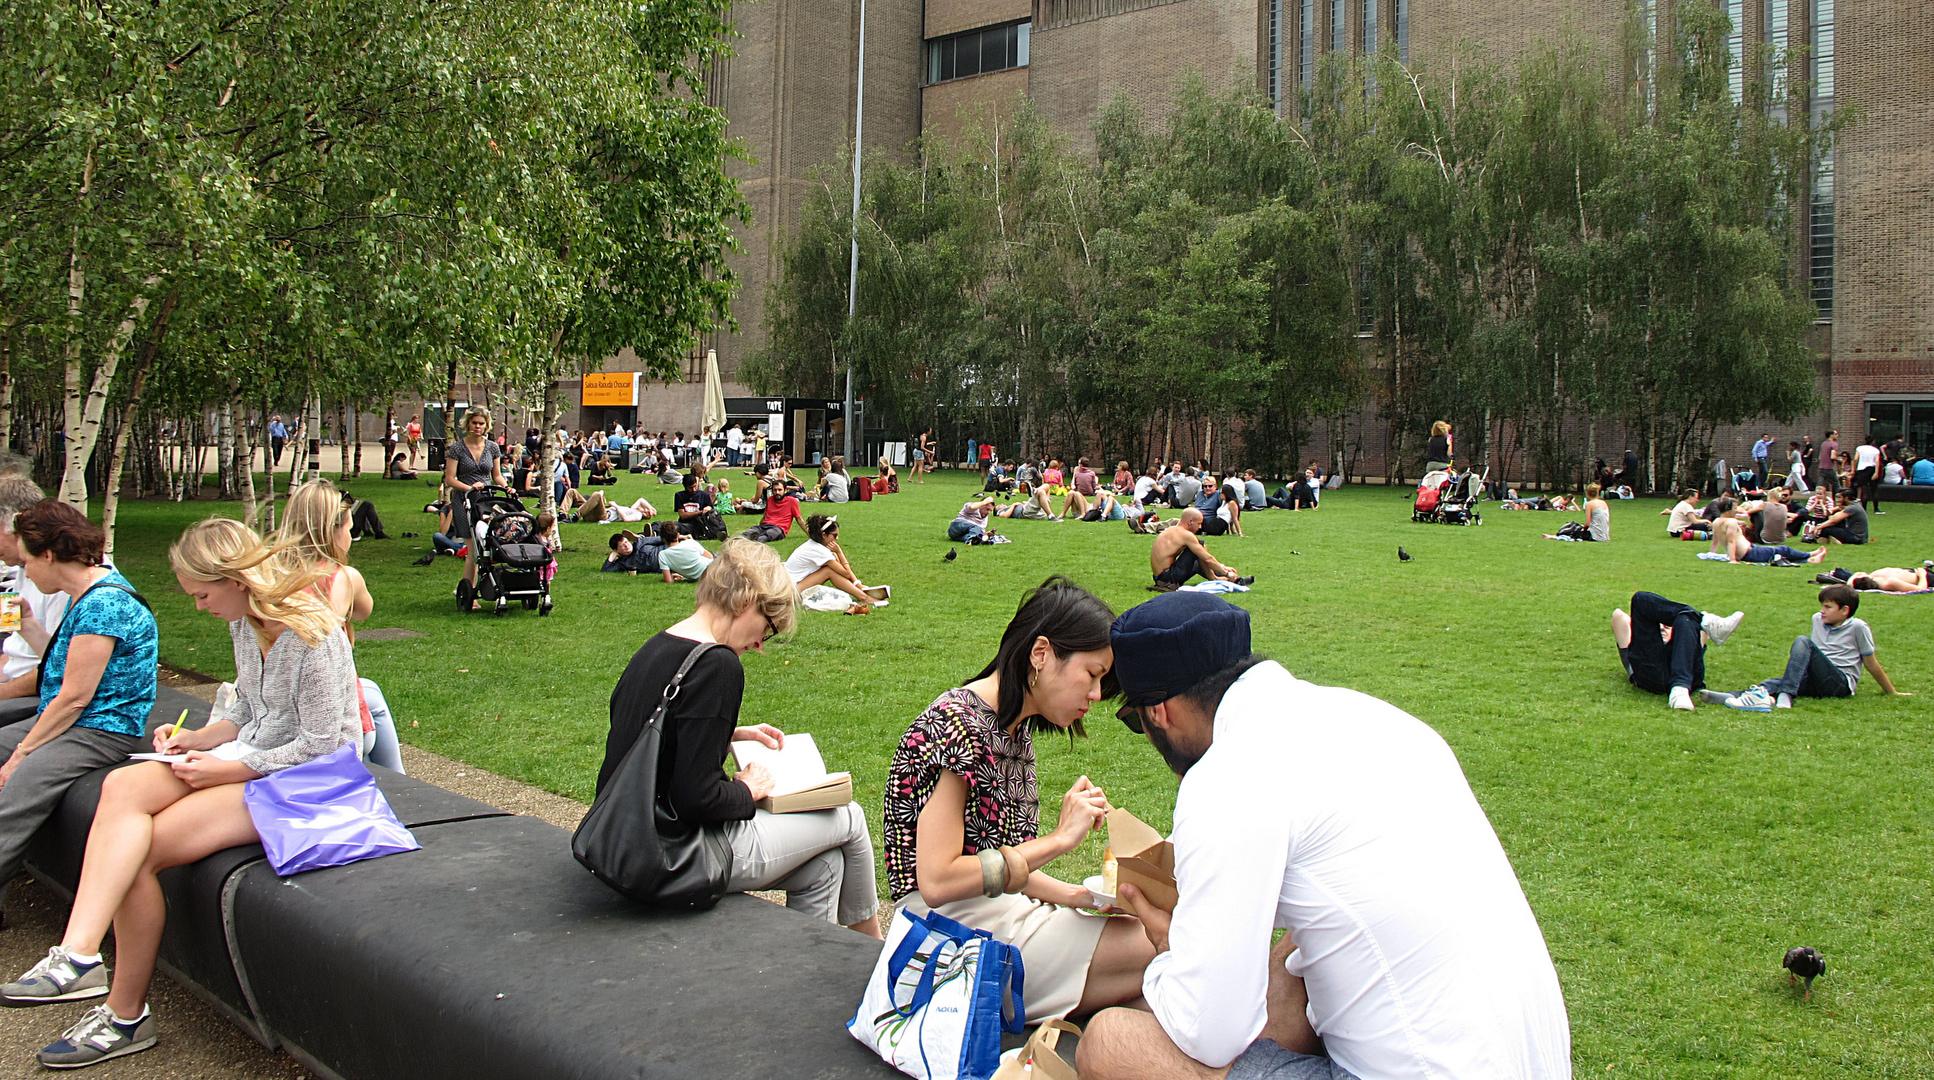 Mittagspause  in London vor der Tate Moderne .